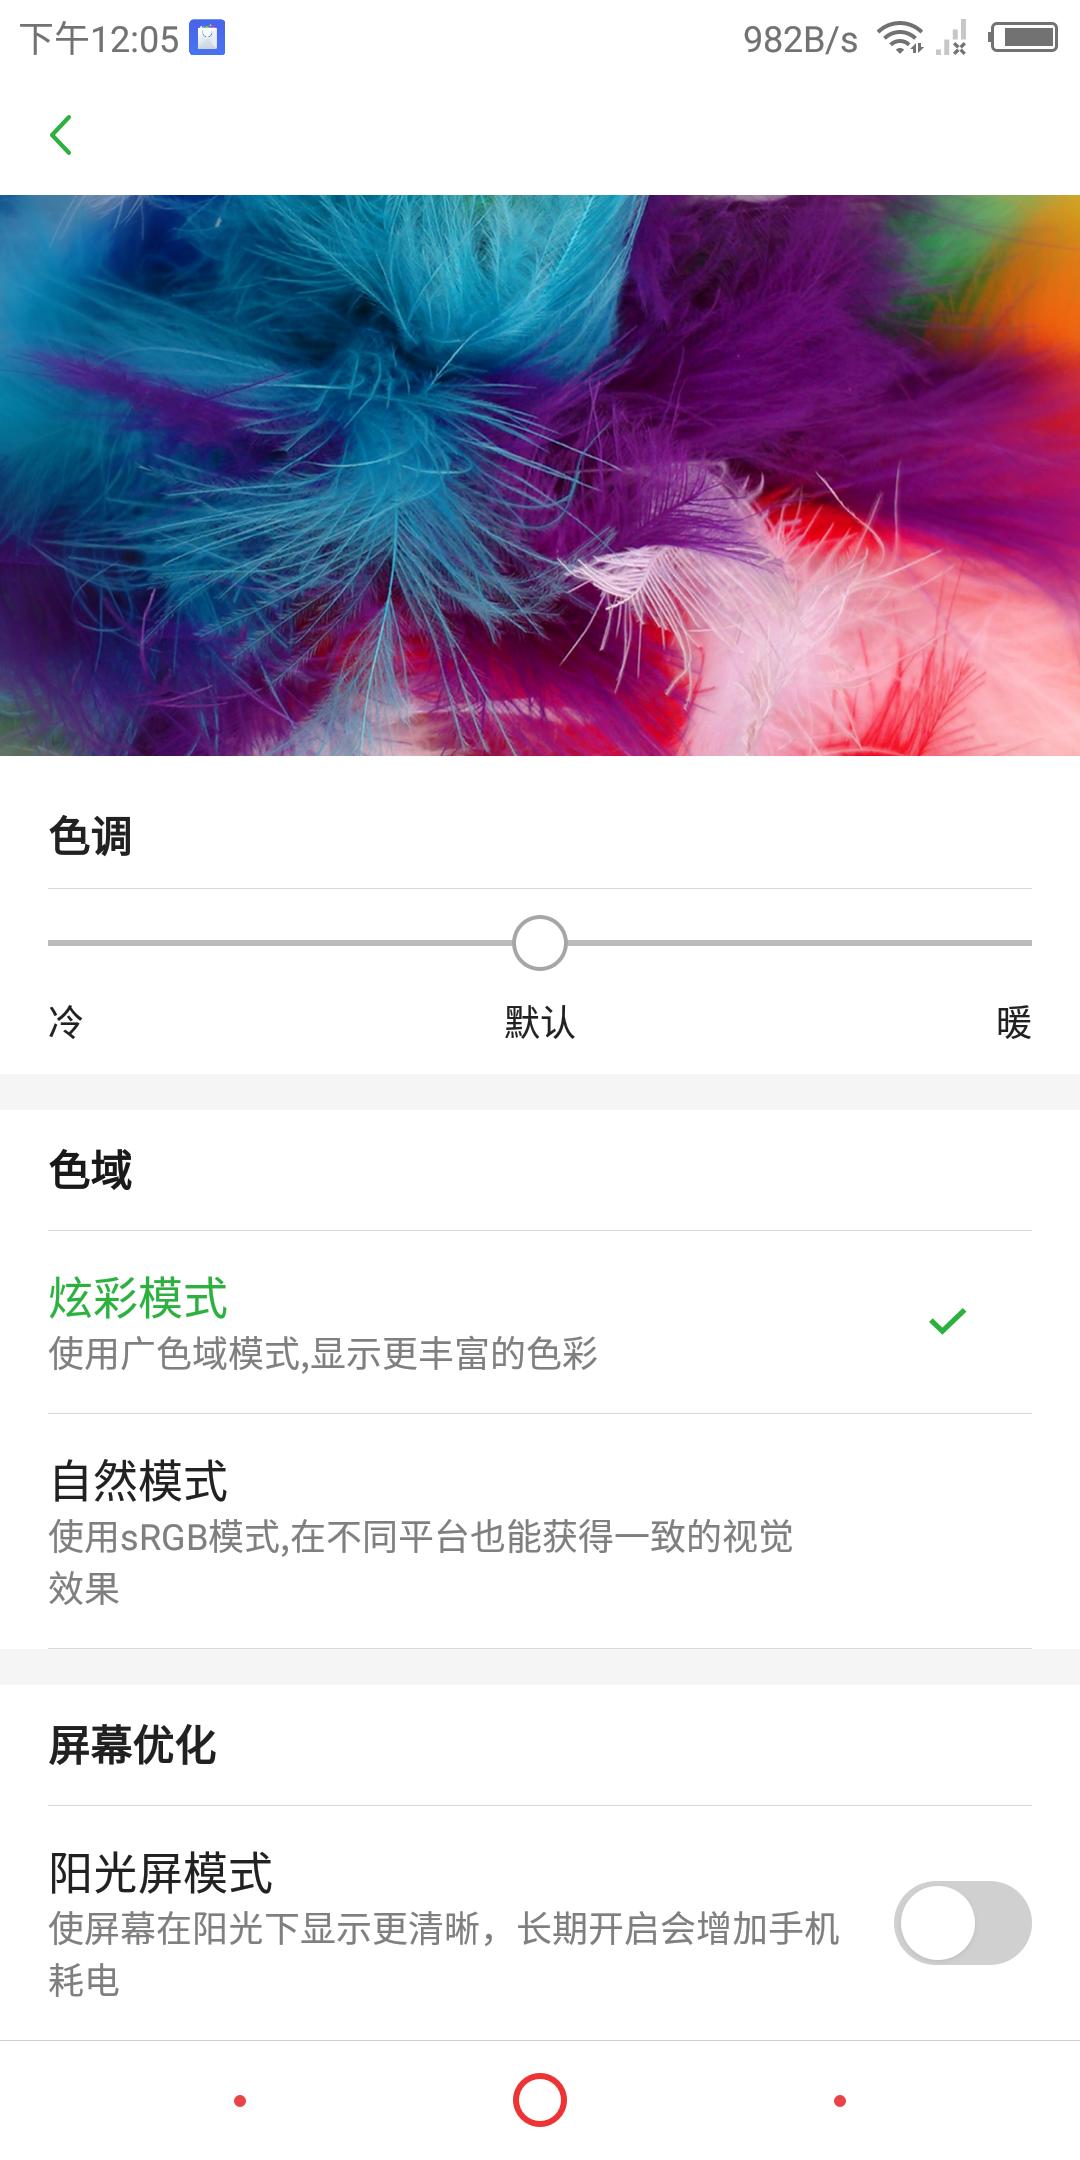 Screenshot_2018-04-27-12-05-24.png